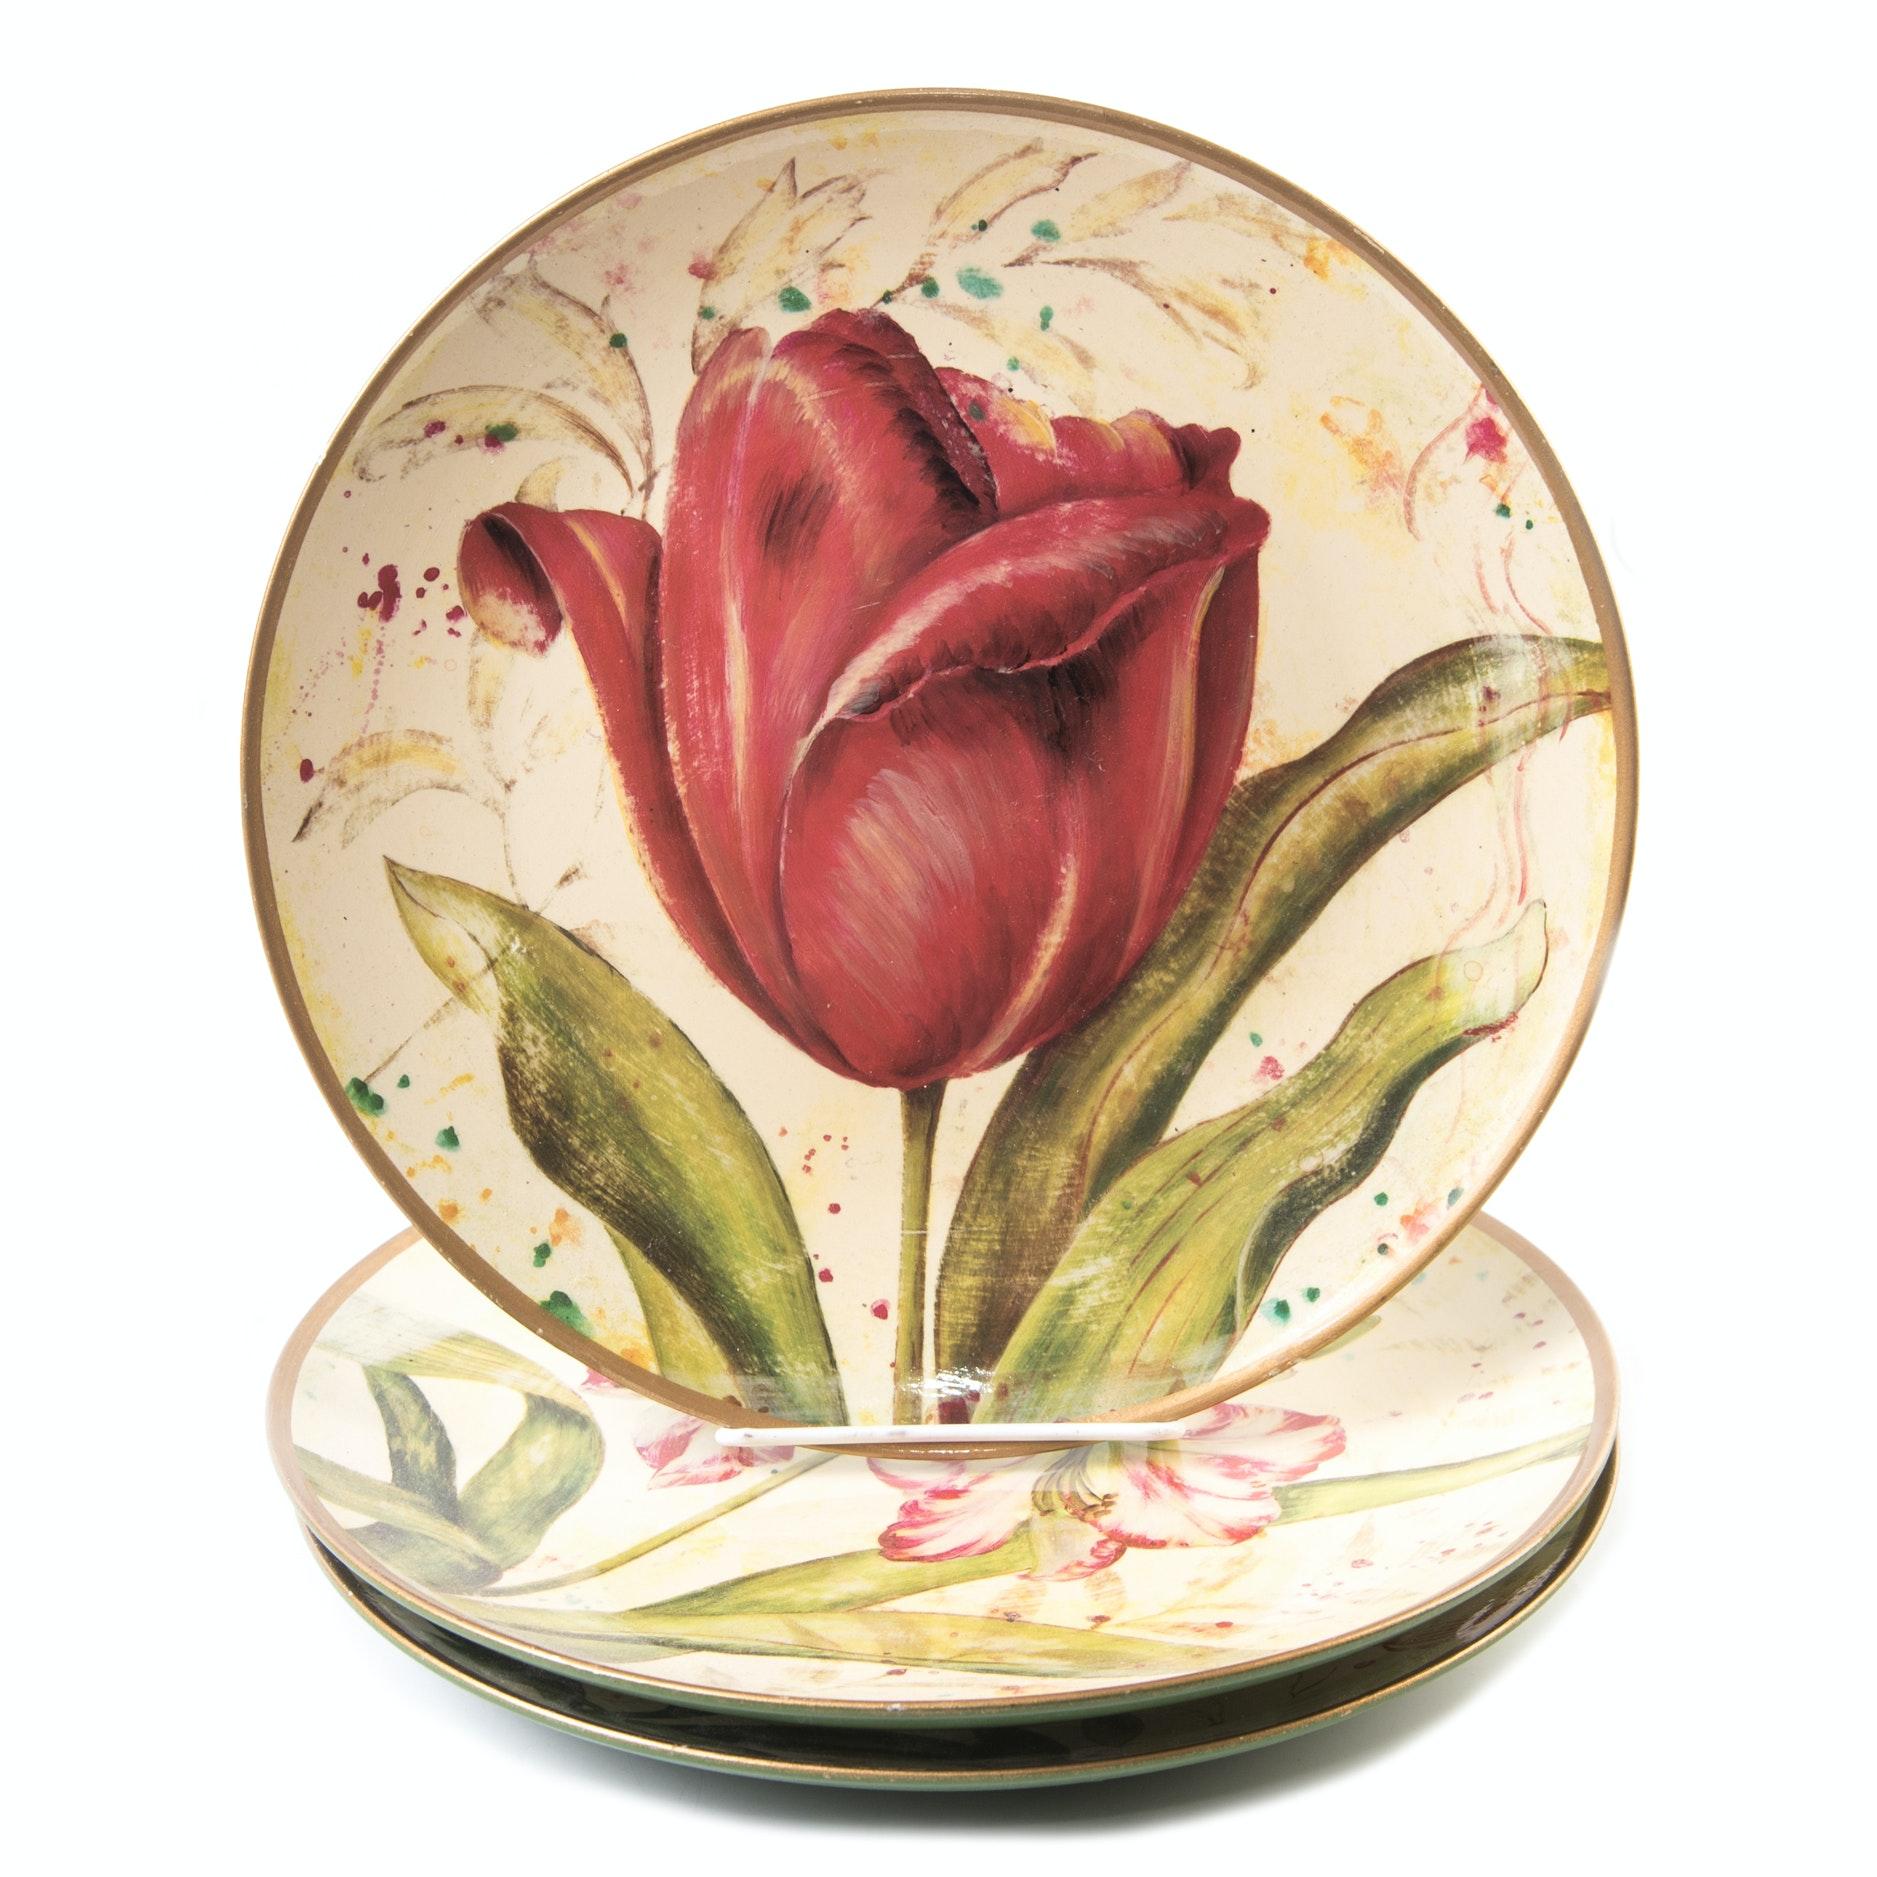 Fabrice de Velleneuve Decorative Floral Plates